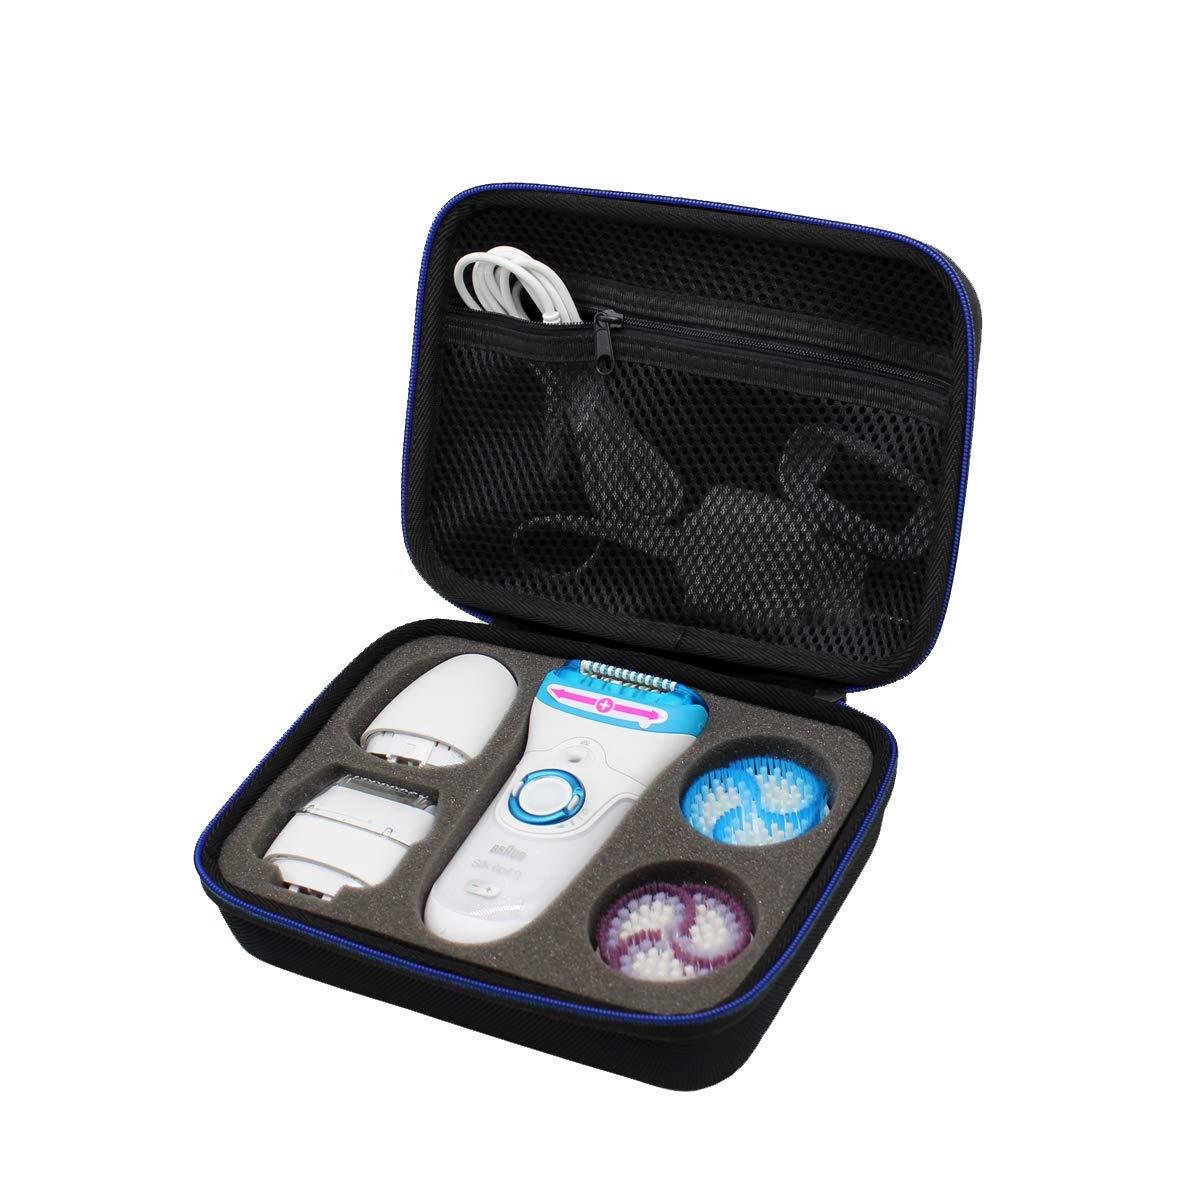 GUBEE Hard Travel Case Bag for Braun Silk-epil 9 SkinSpa 9-961v 5-in-1 Epilator/Epilation